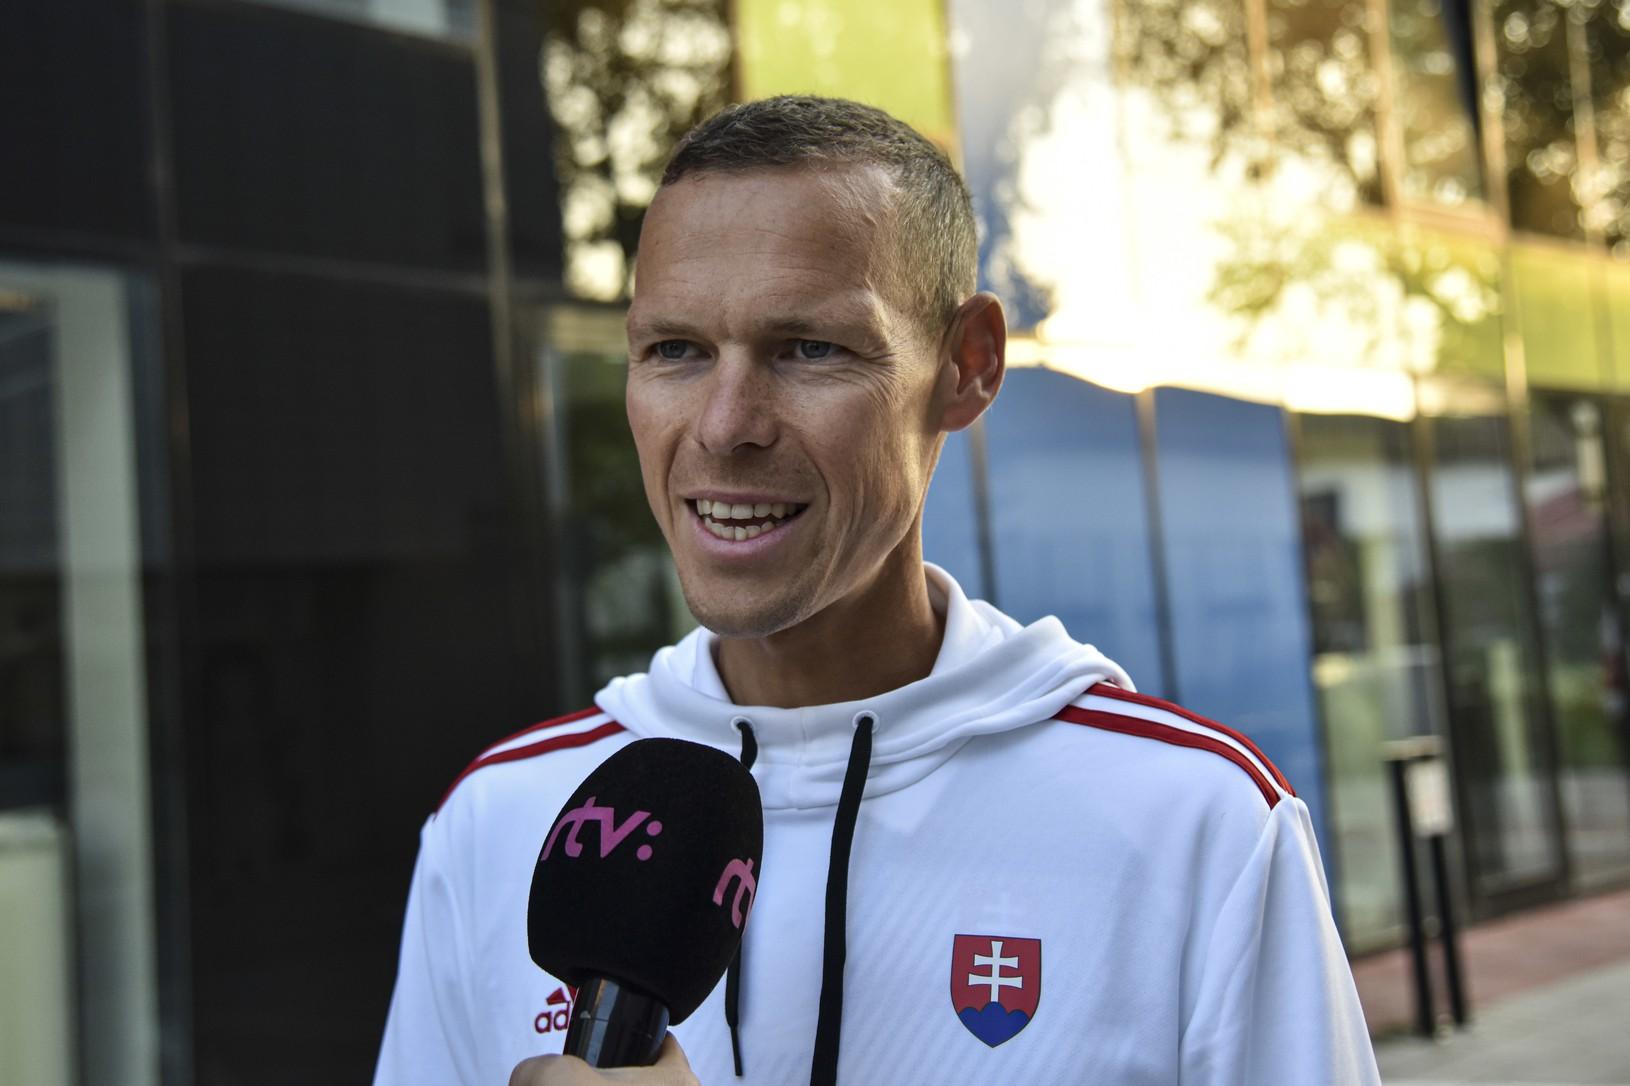 Matej Tóth